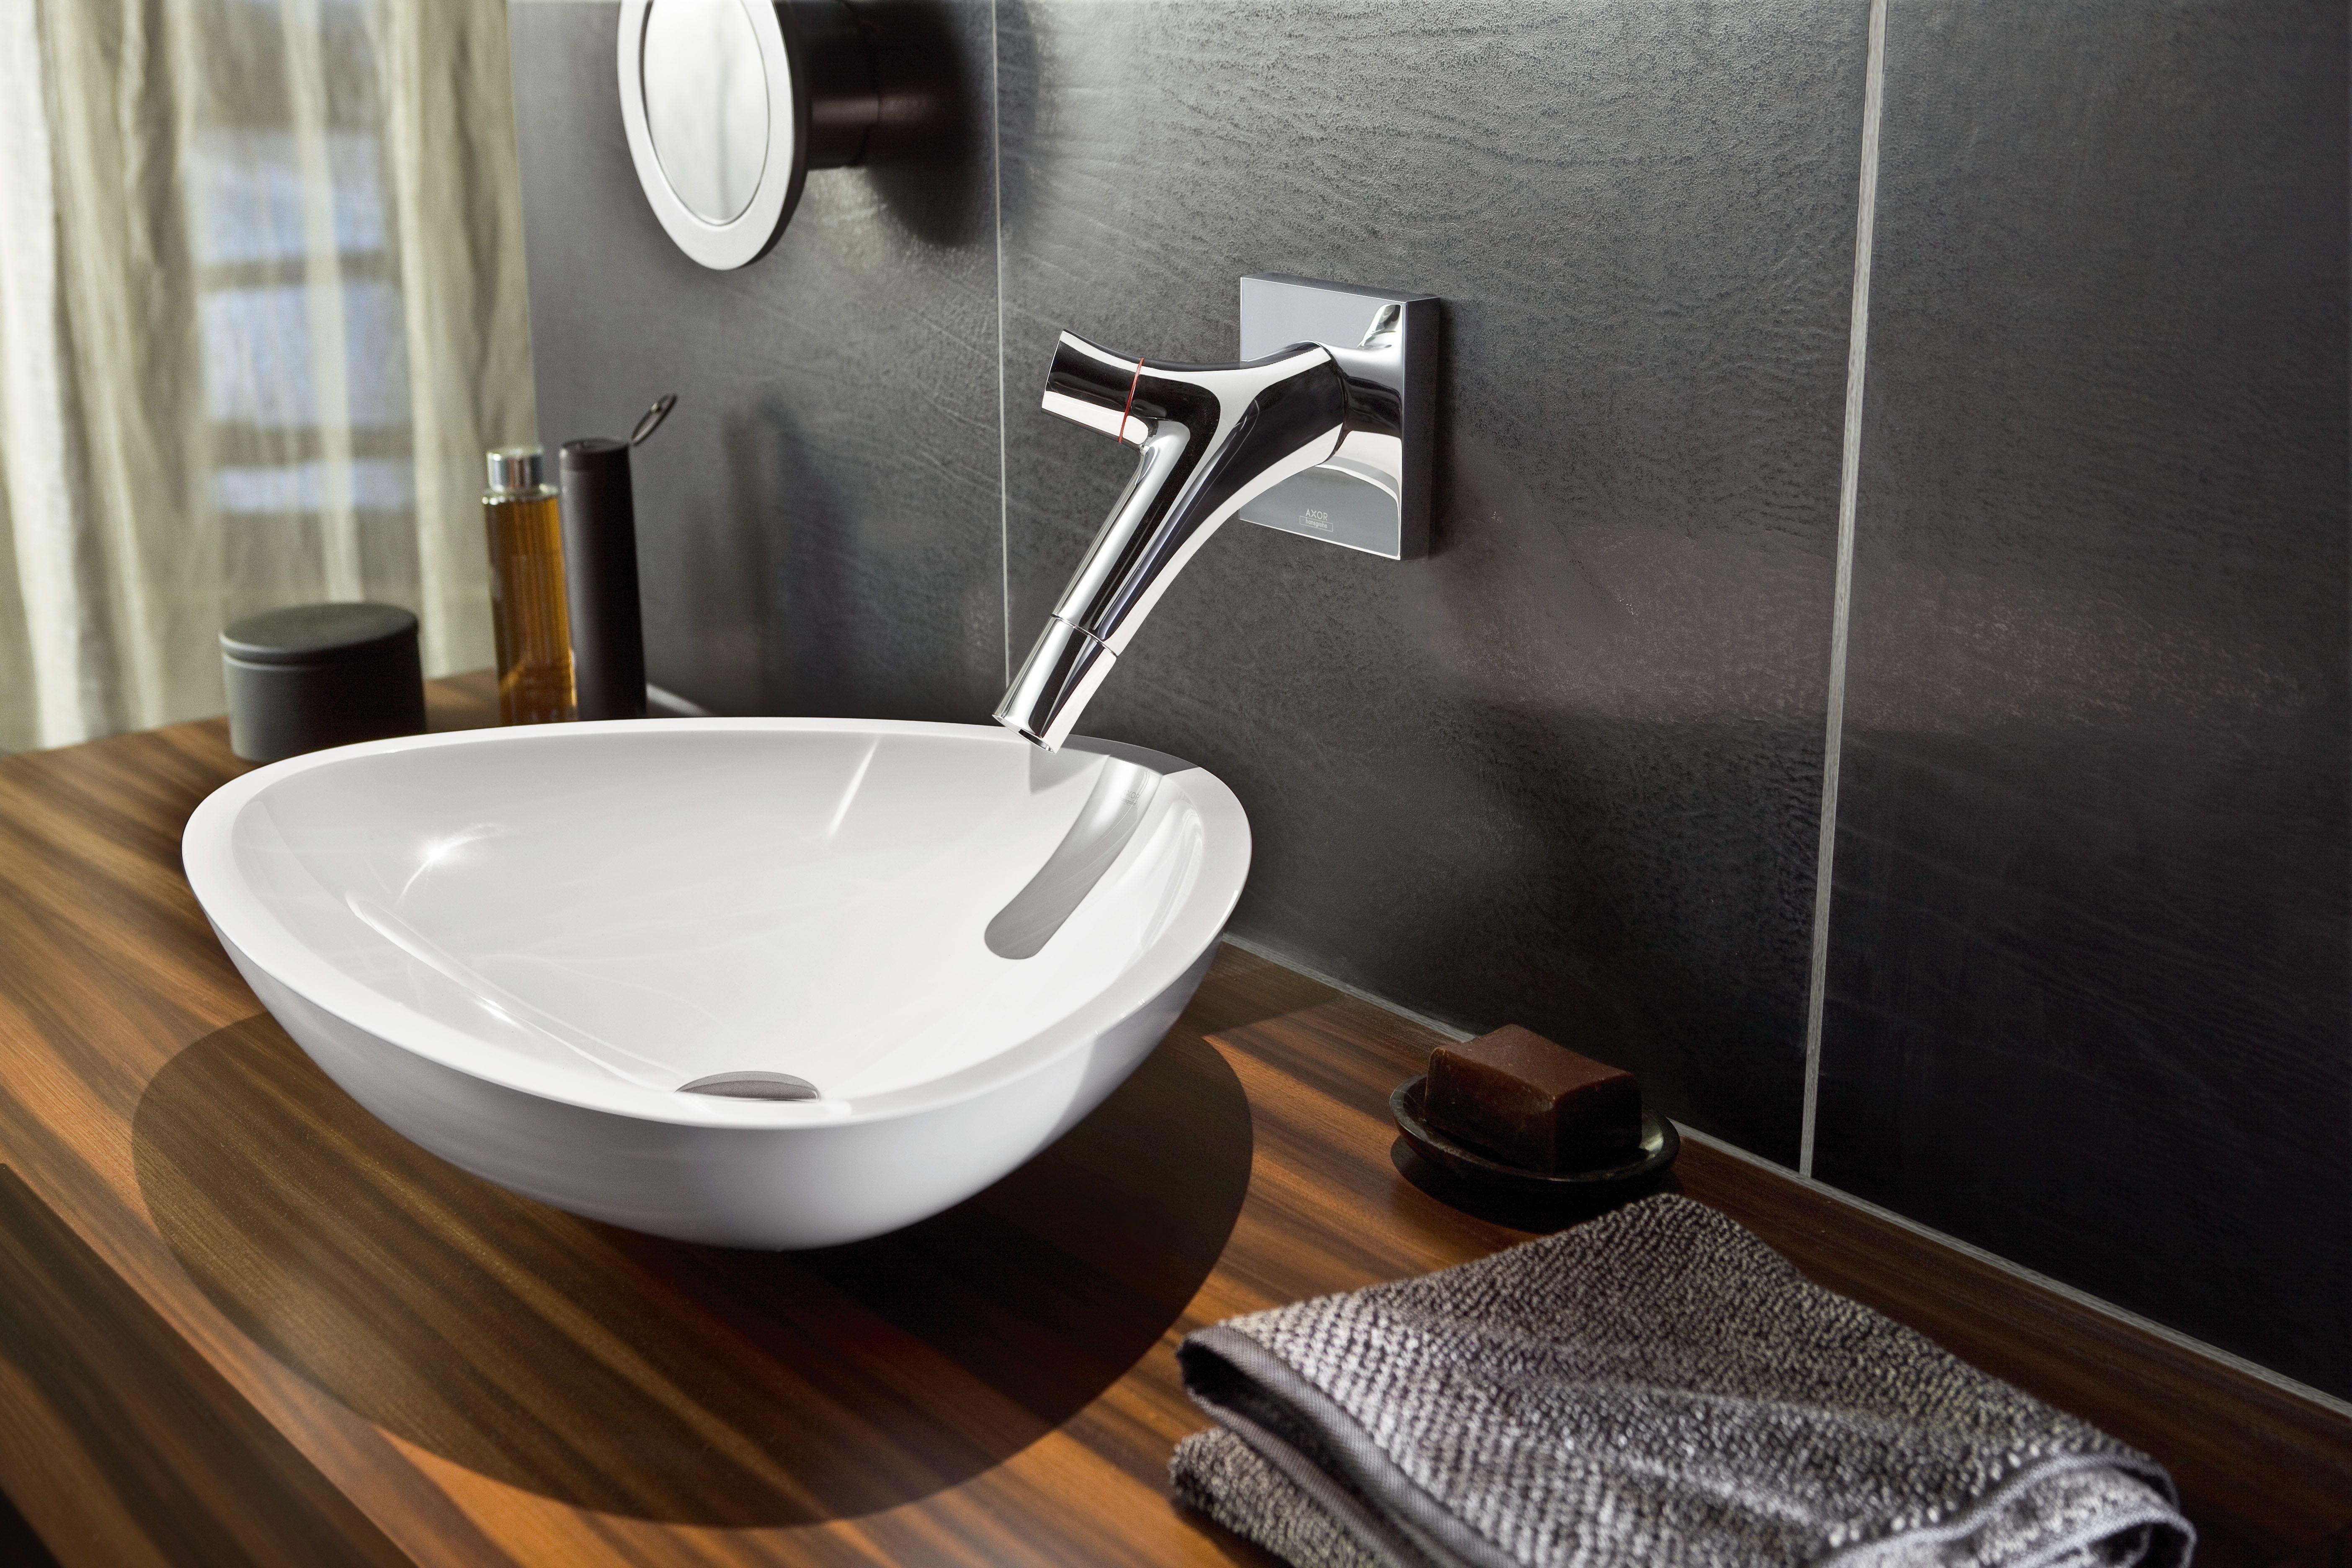 Axor Strack Organic 2-Handle Wall-Mounted Faucet | Sala de baño ...